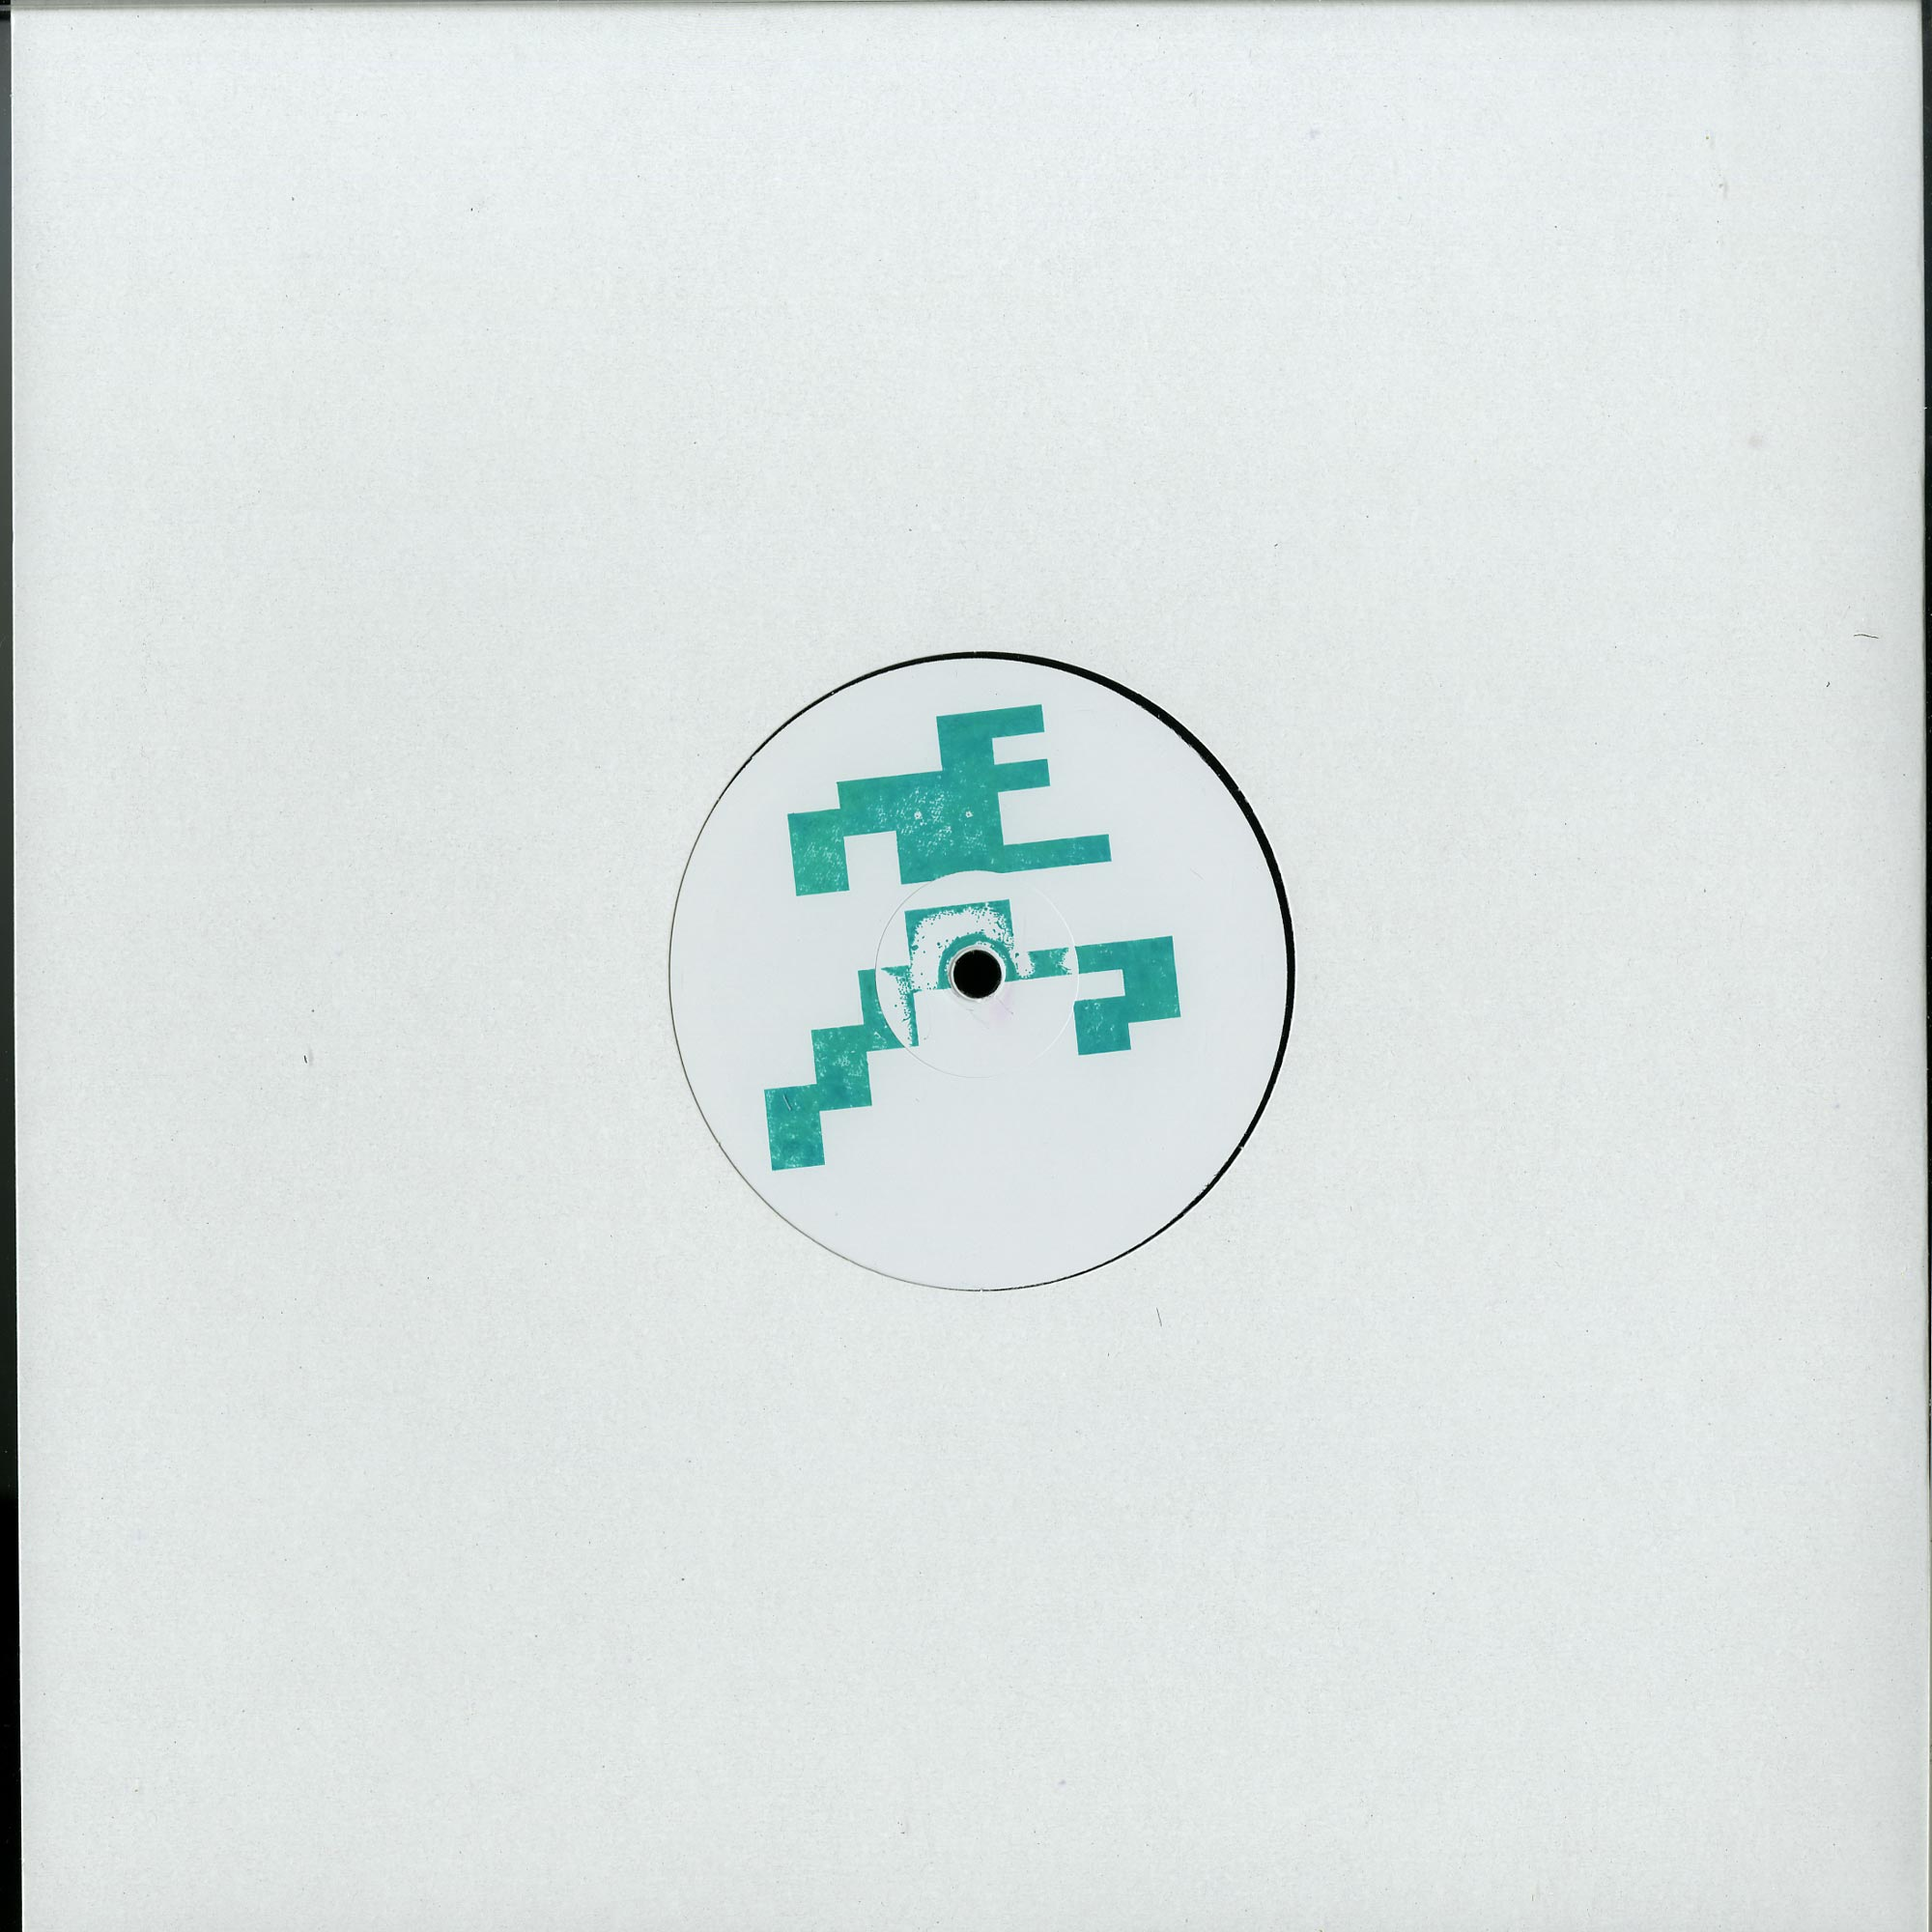 Donato Dozzy - AFTERHOUSE 01